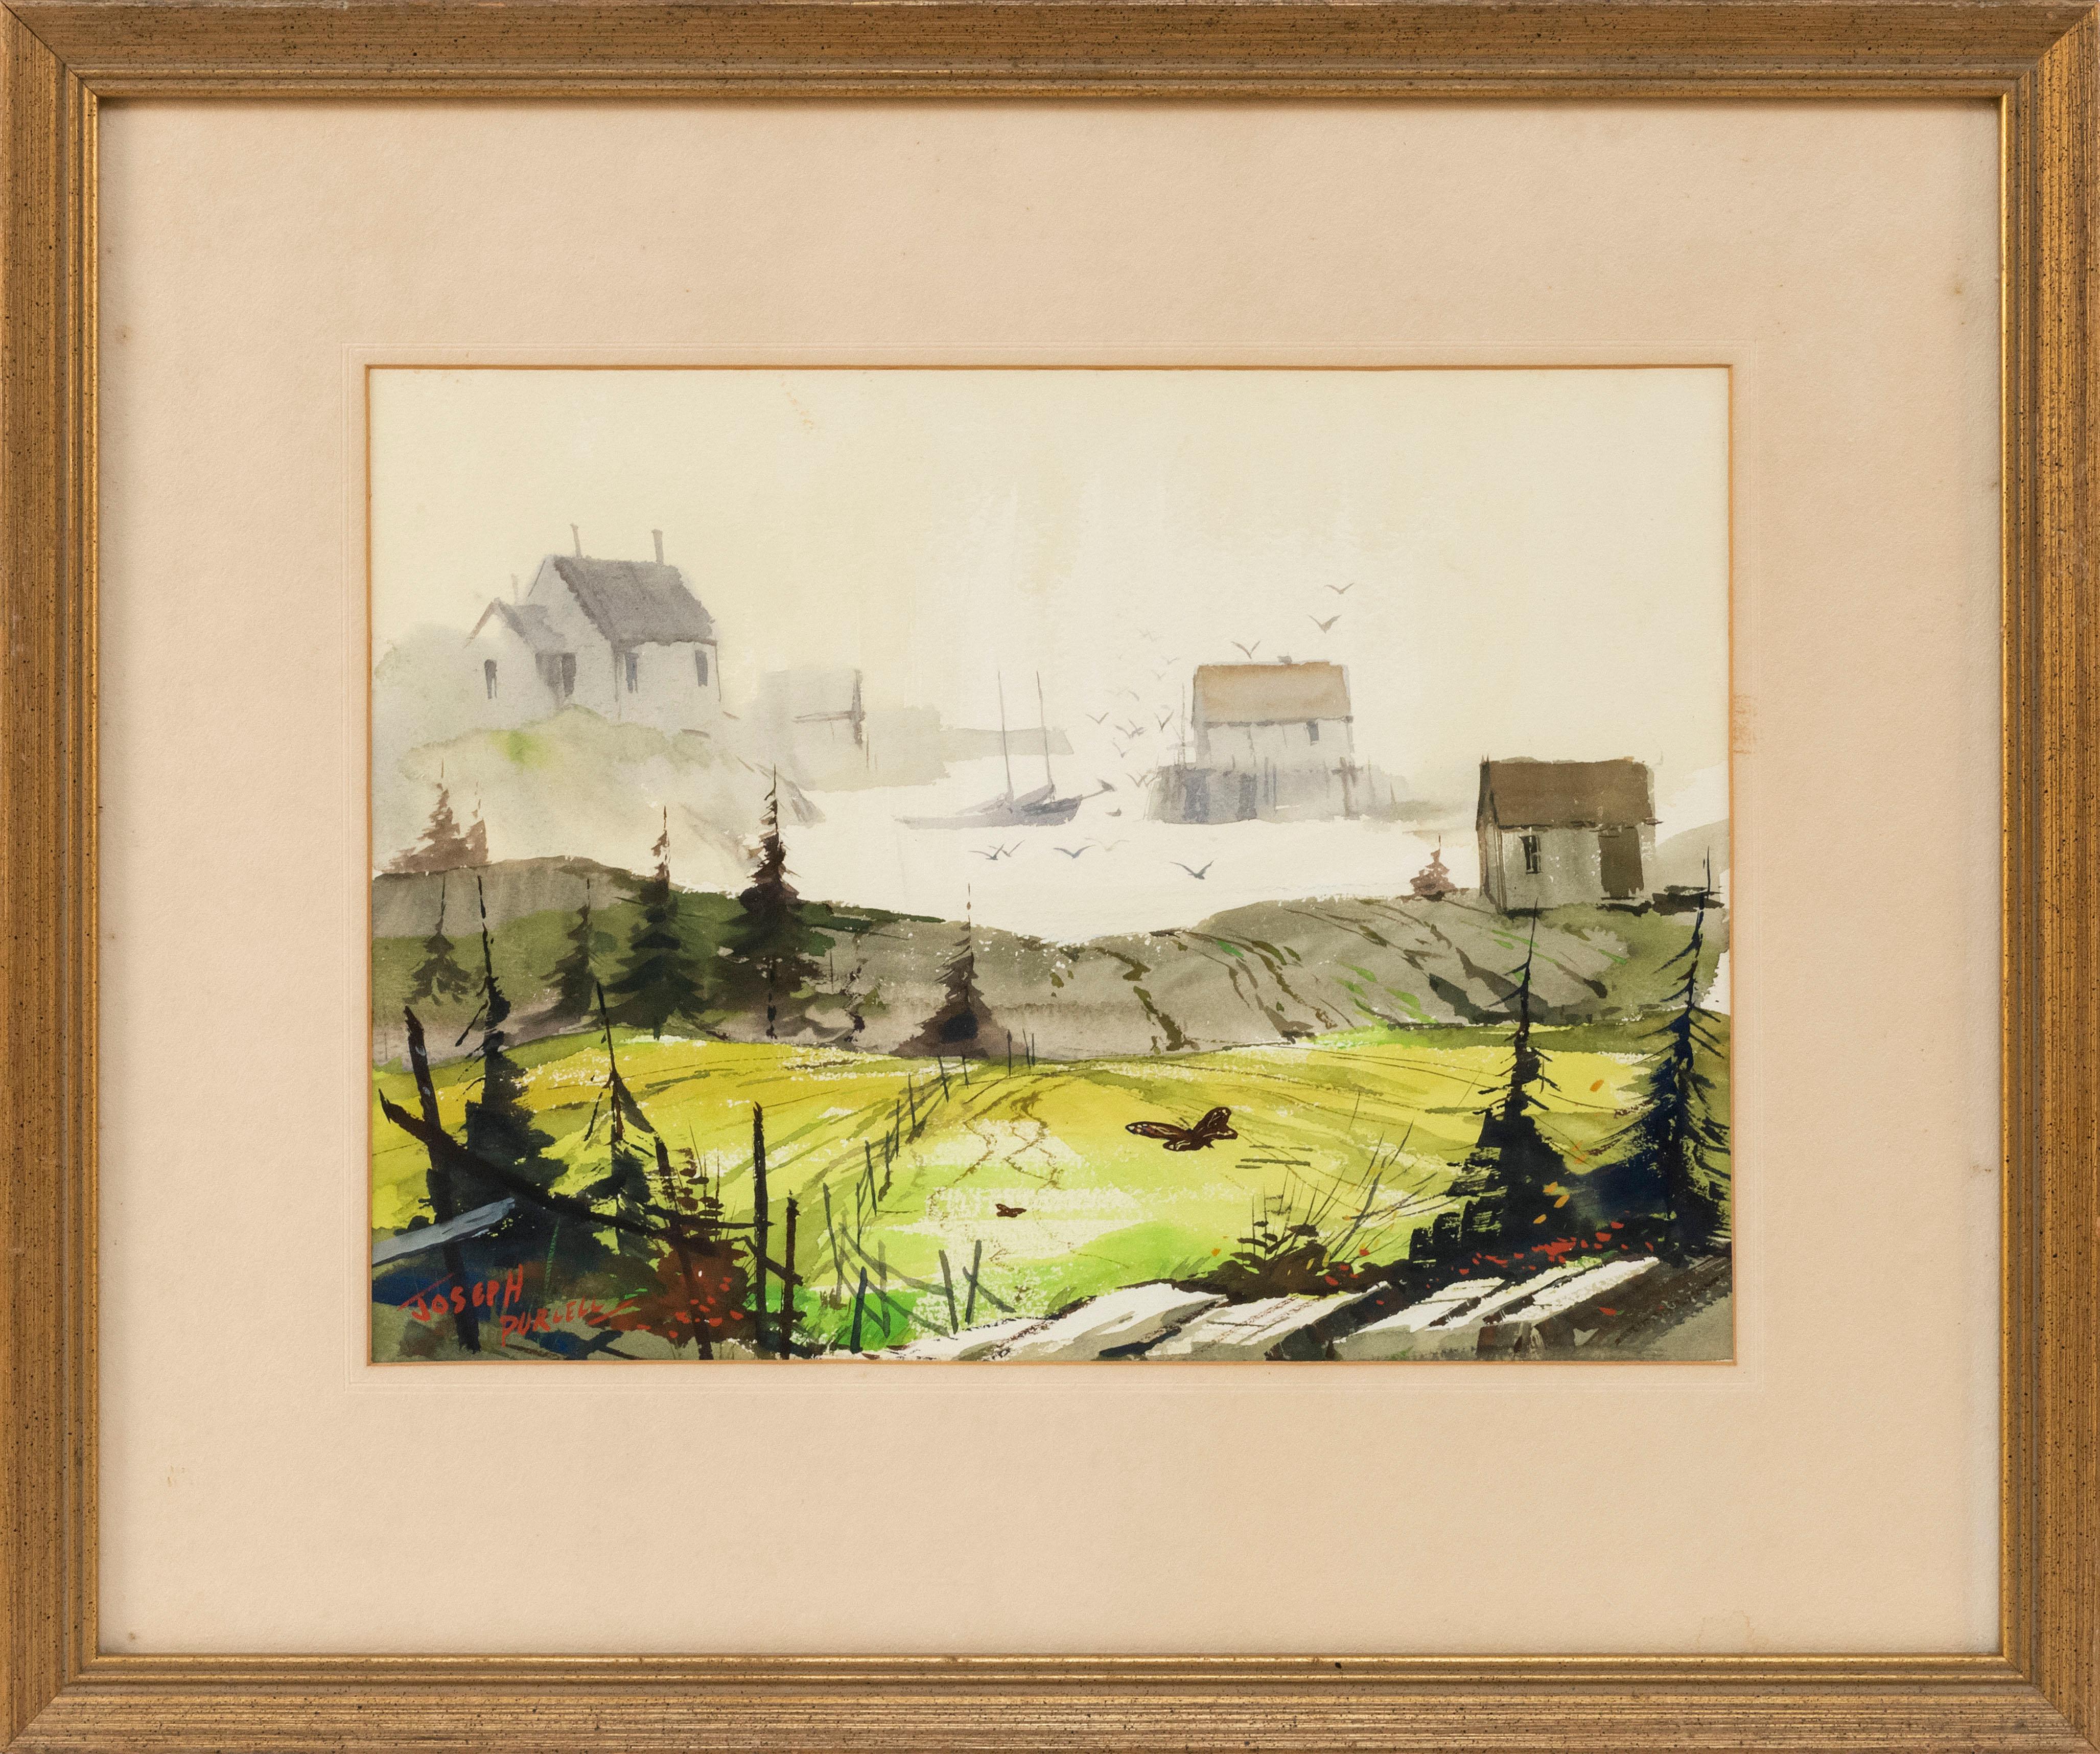 "JOSEPH DOUGLAS PURCELL, Canada, 1927-2015, ""Mahone Bay, Nova Scotia""., Watercolor on paper, 10.5"" x 14"" sight. Framed 18.5"" x 22""."